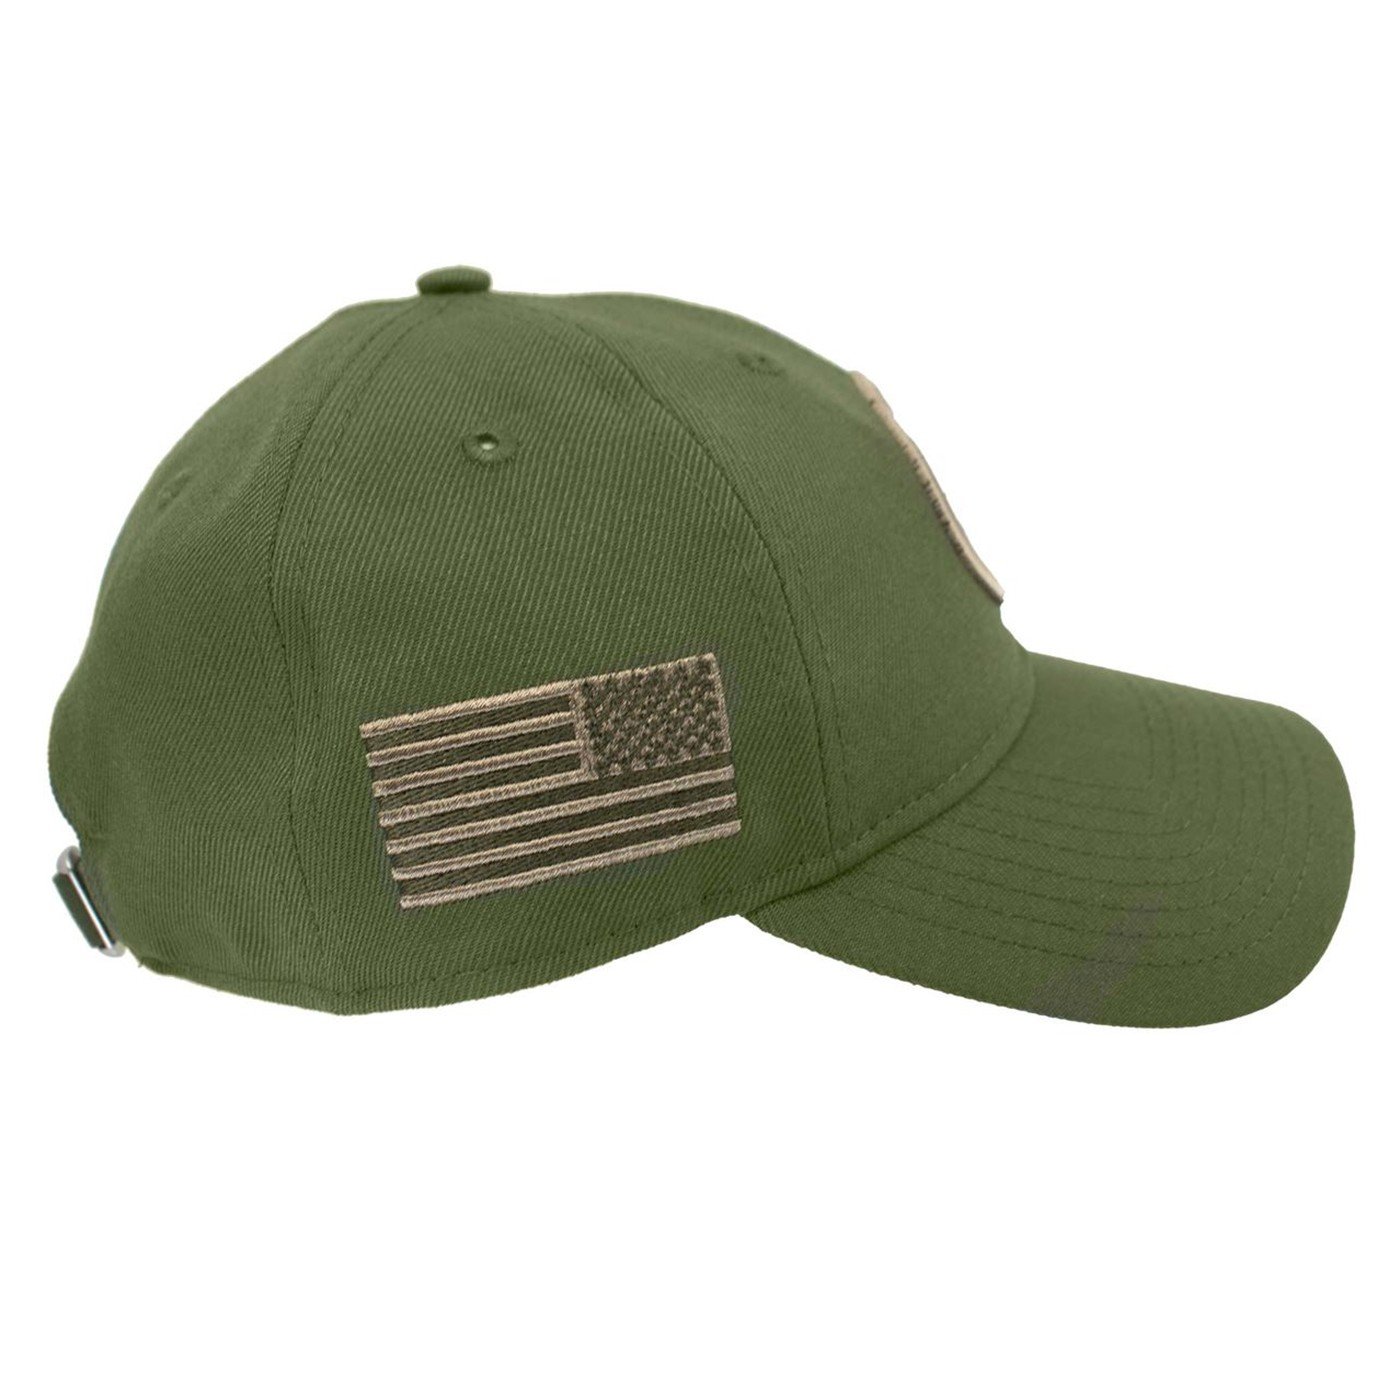 Black Panther Salute to Service 9Twenty Adjustable Hat